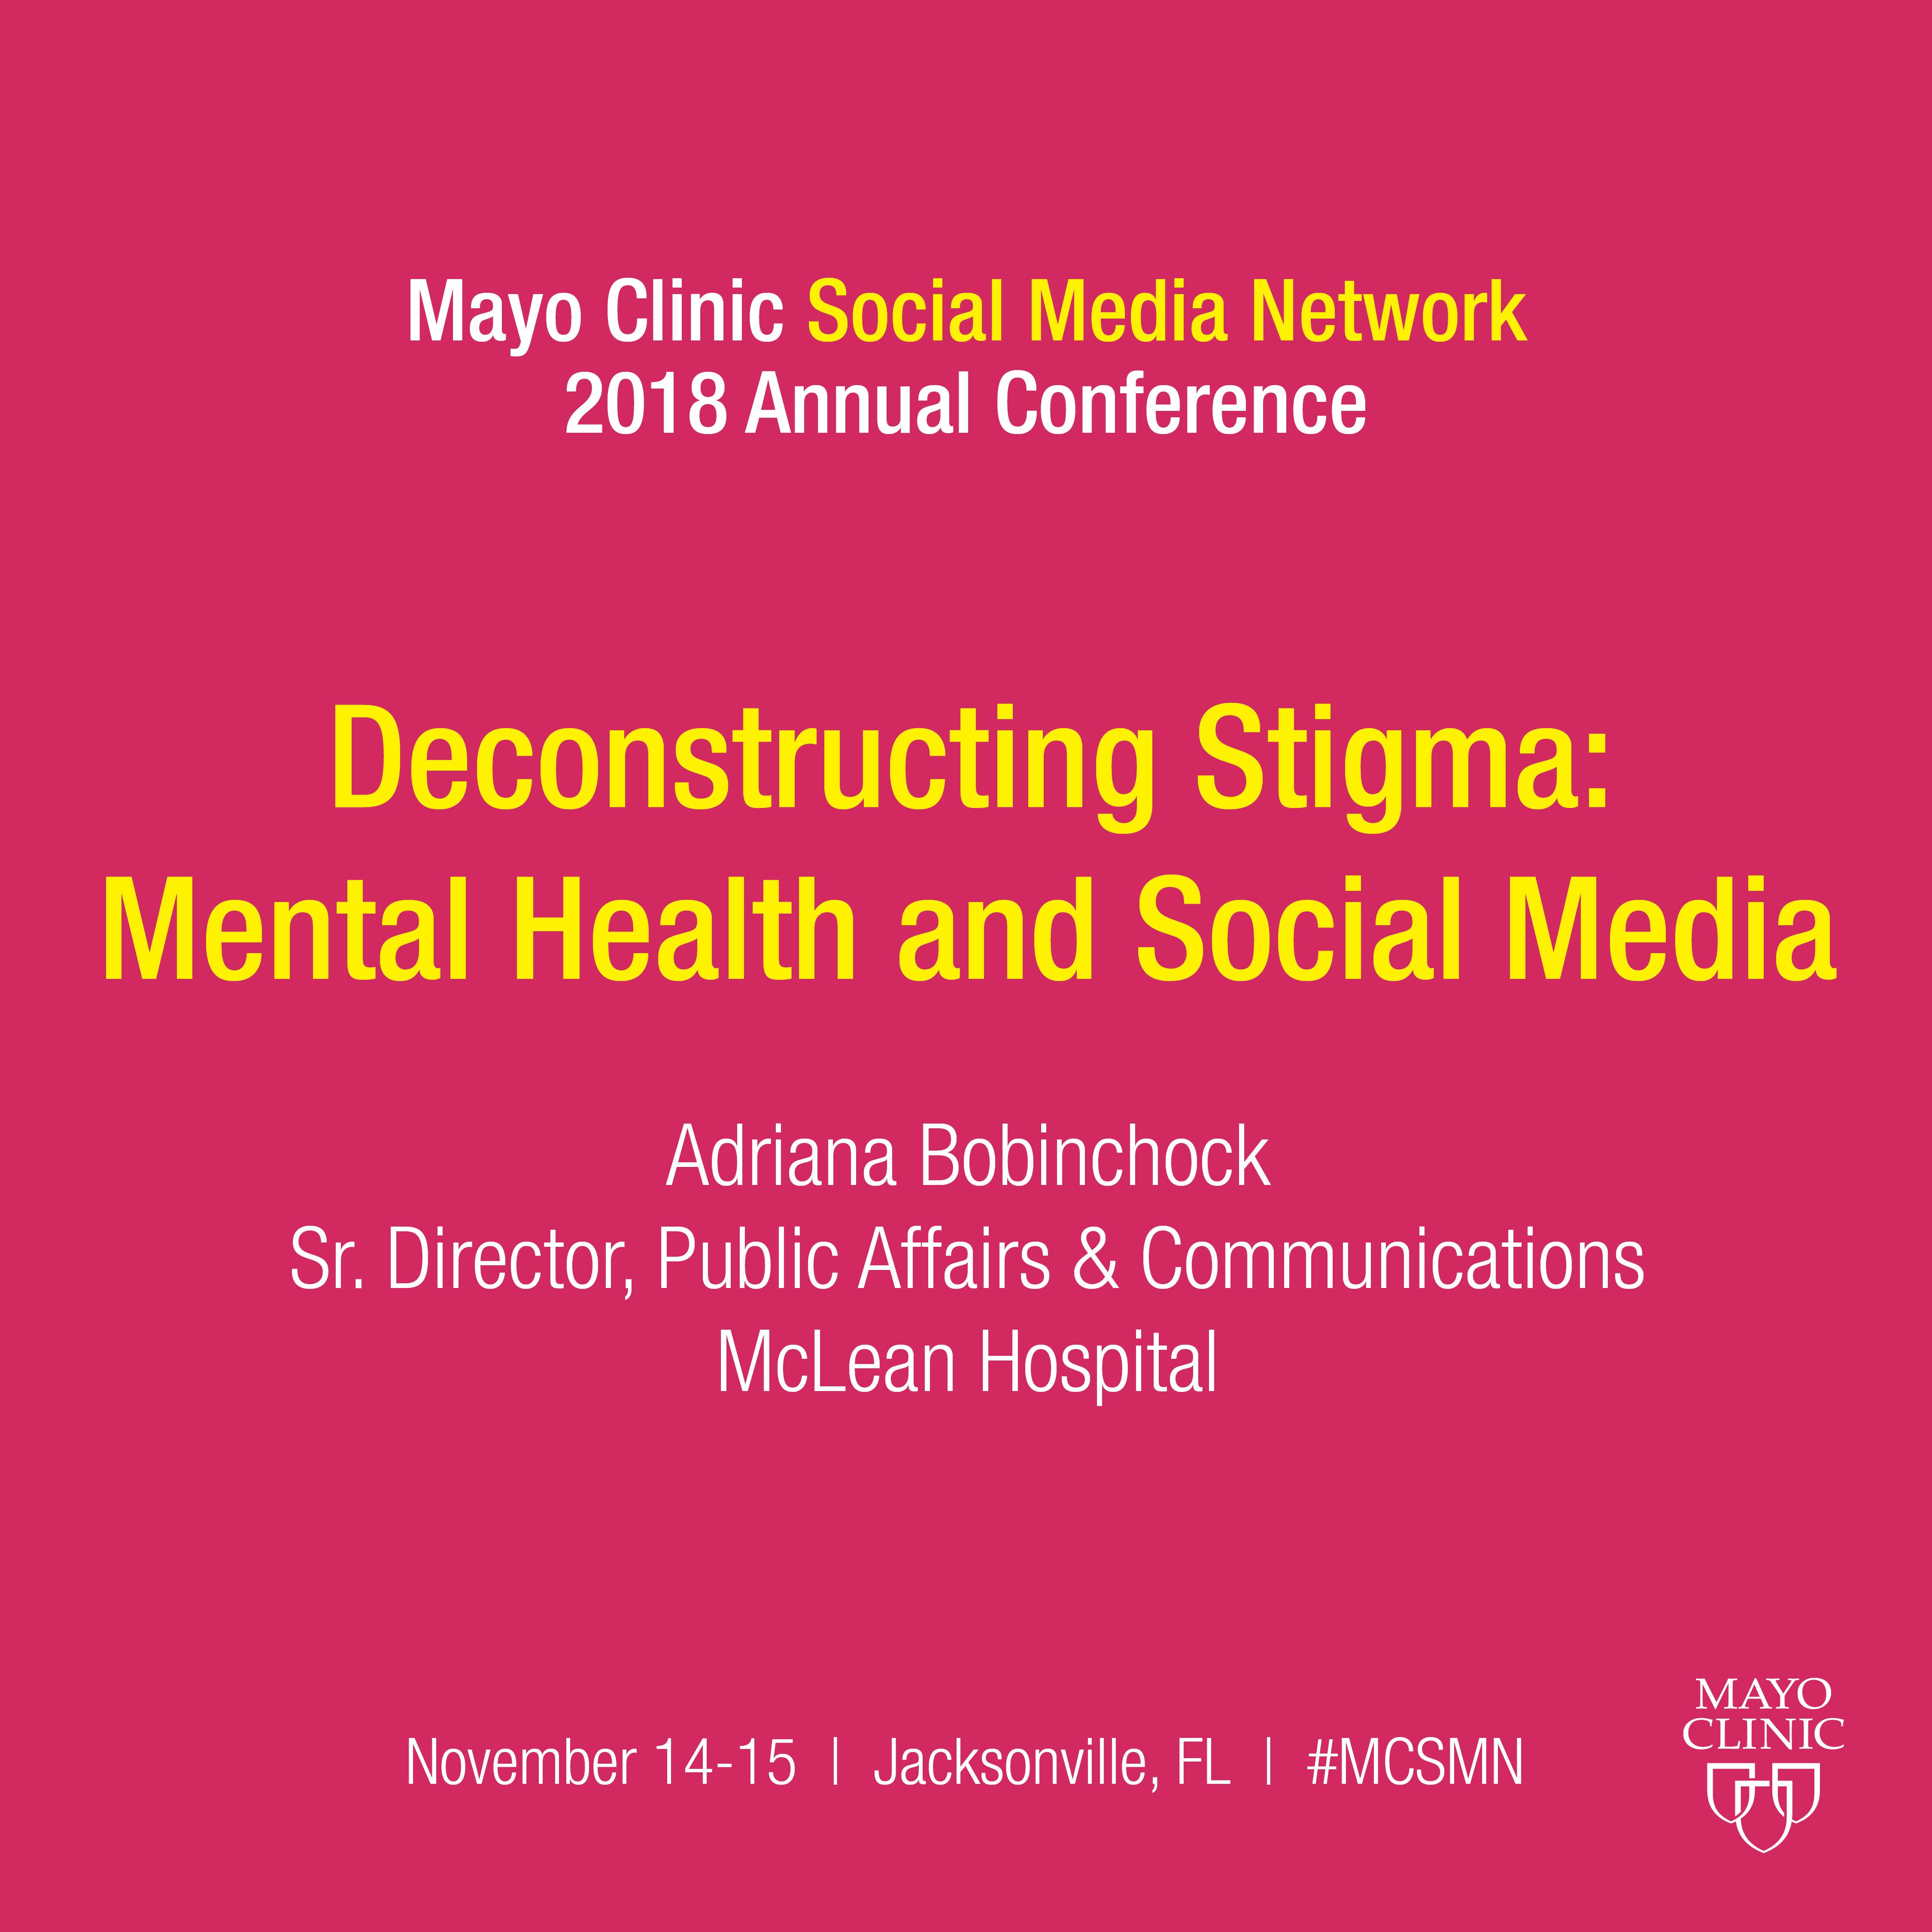 Mental Illness and Social Media | Mayo Clinic Social Media Network